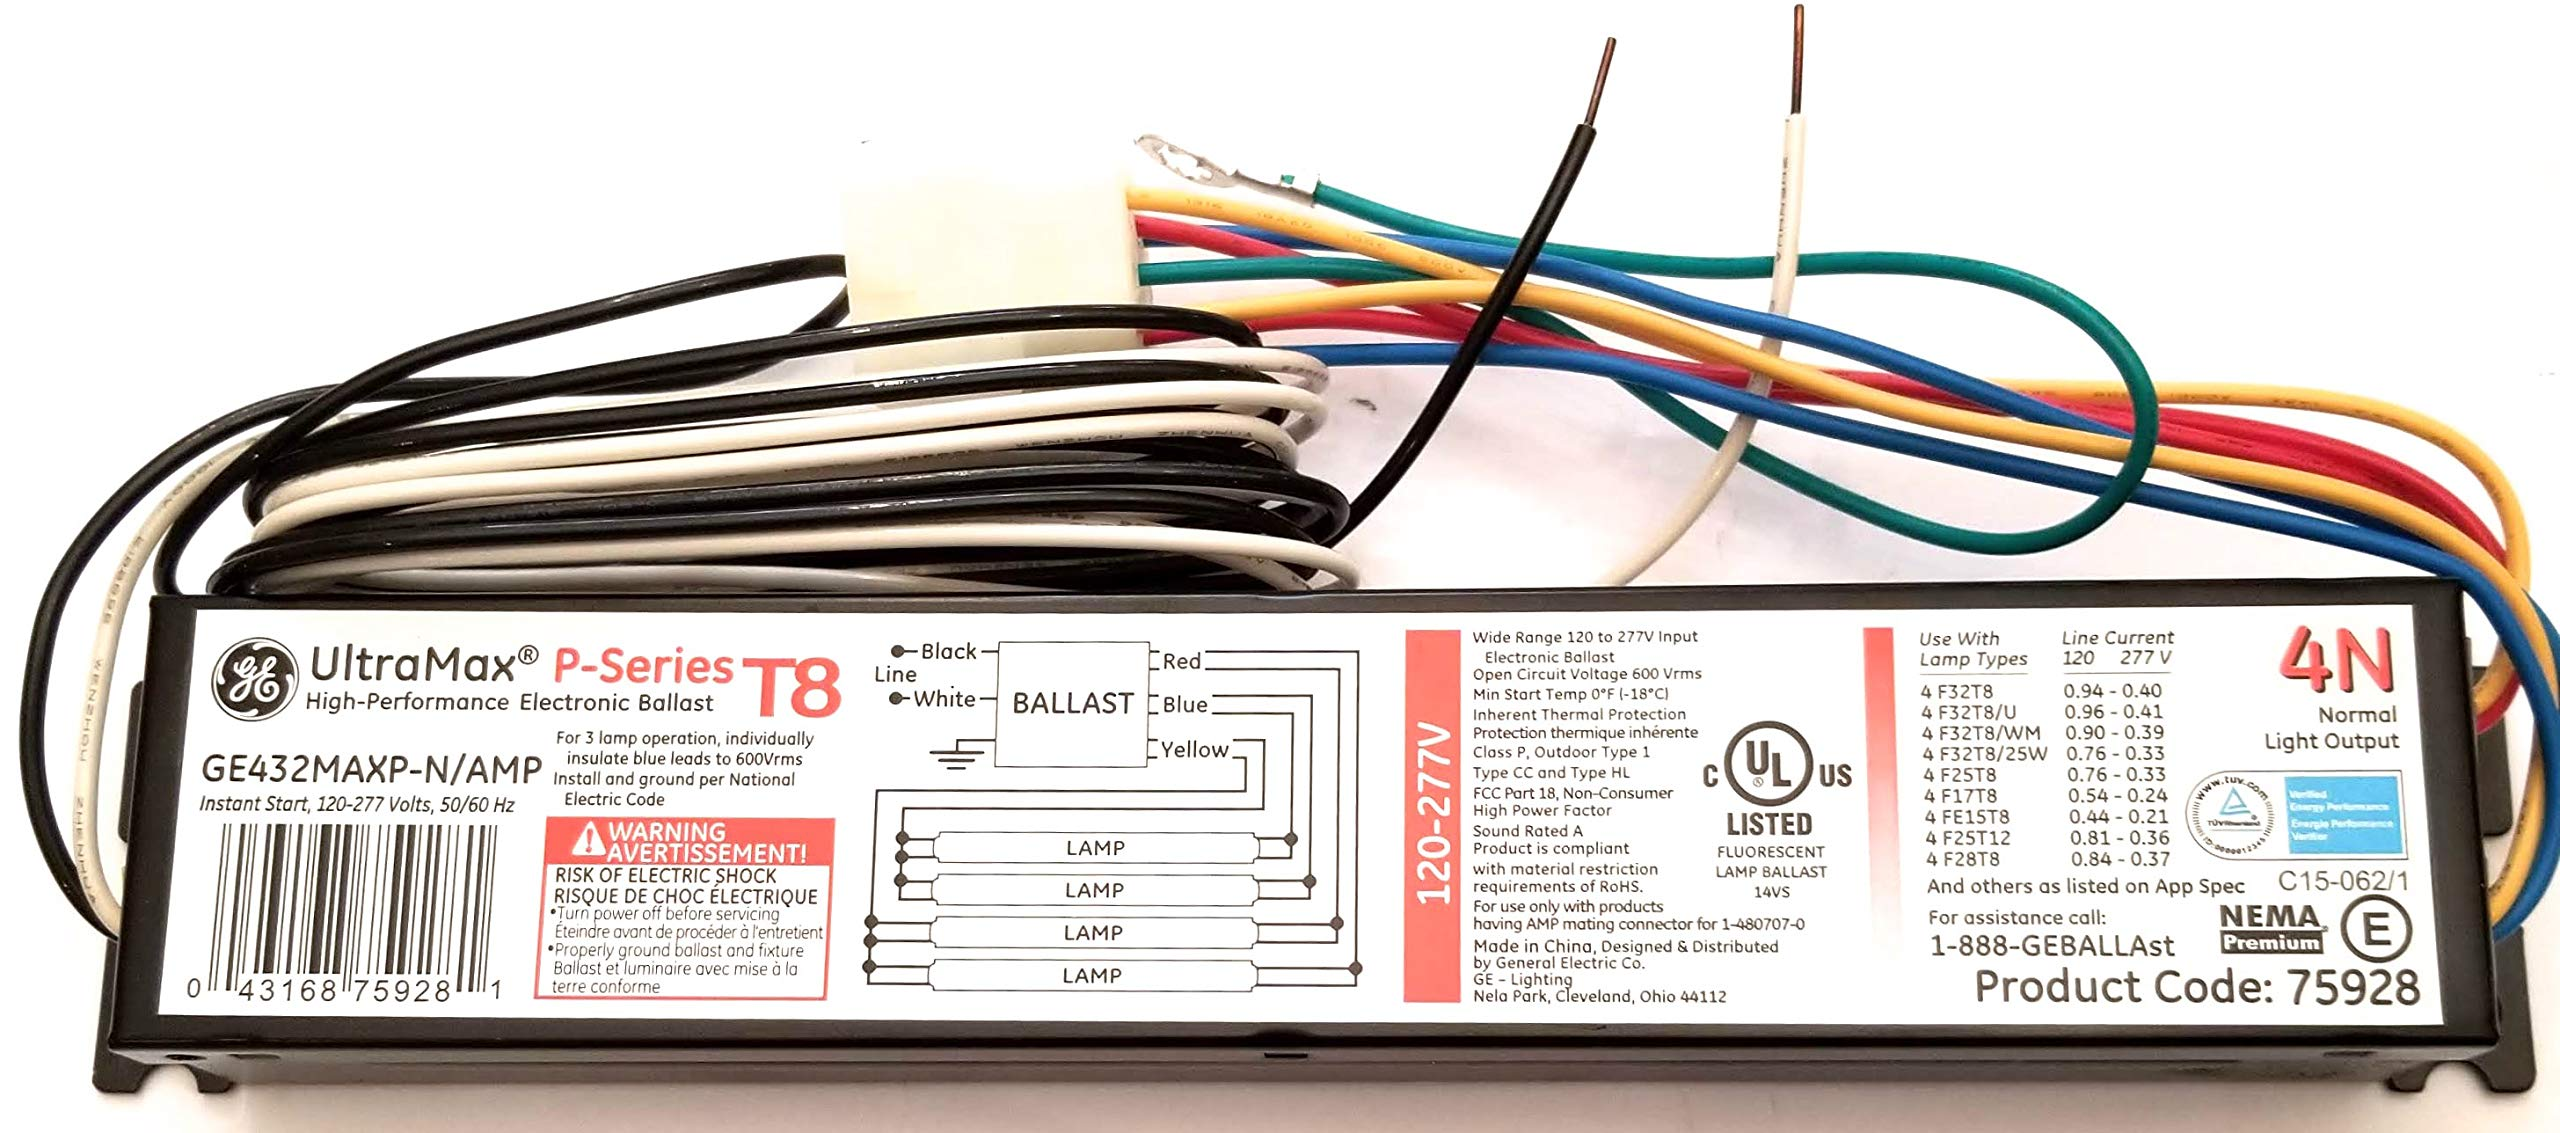 (10 Pack) GE 75928 GE432MAXP-N/Amp 3 or 4 Lamp T8 Electronic Ballast F32T8 F25T8 F17T8 FE15T8 F25T12 F28T8 F36T8 F40T8-120 Volt To 277 Volt - Ultra Max 4N Amp Connector P Series